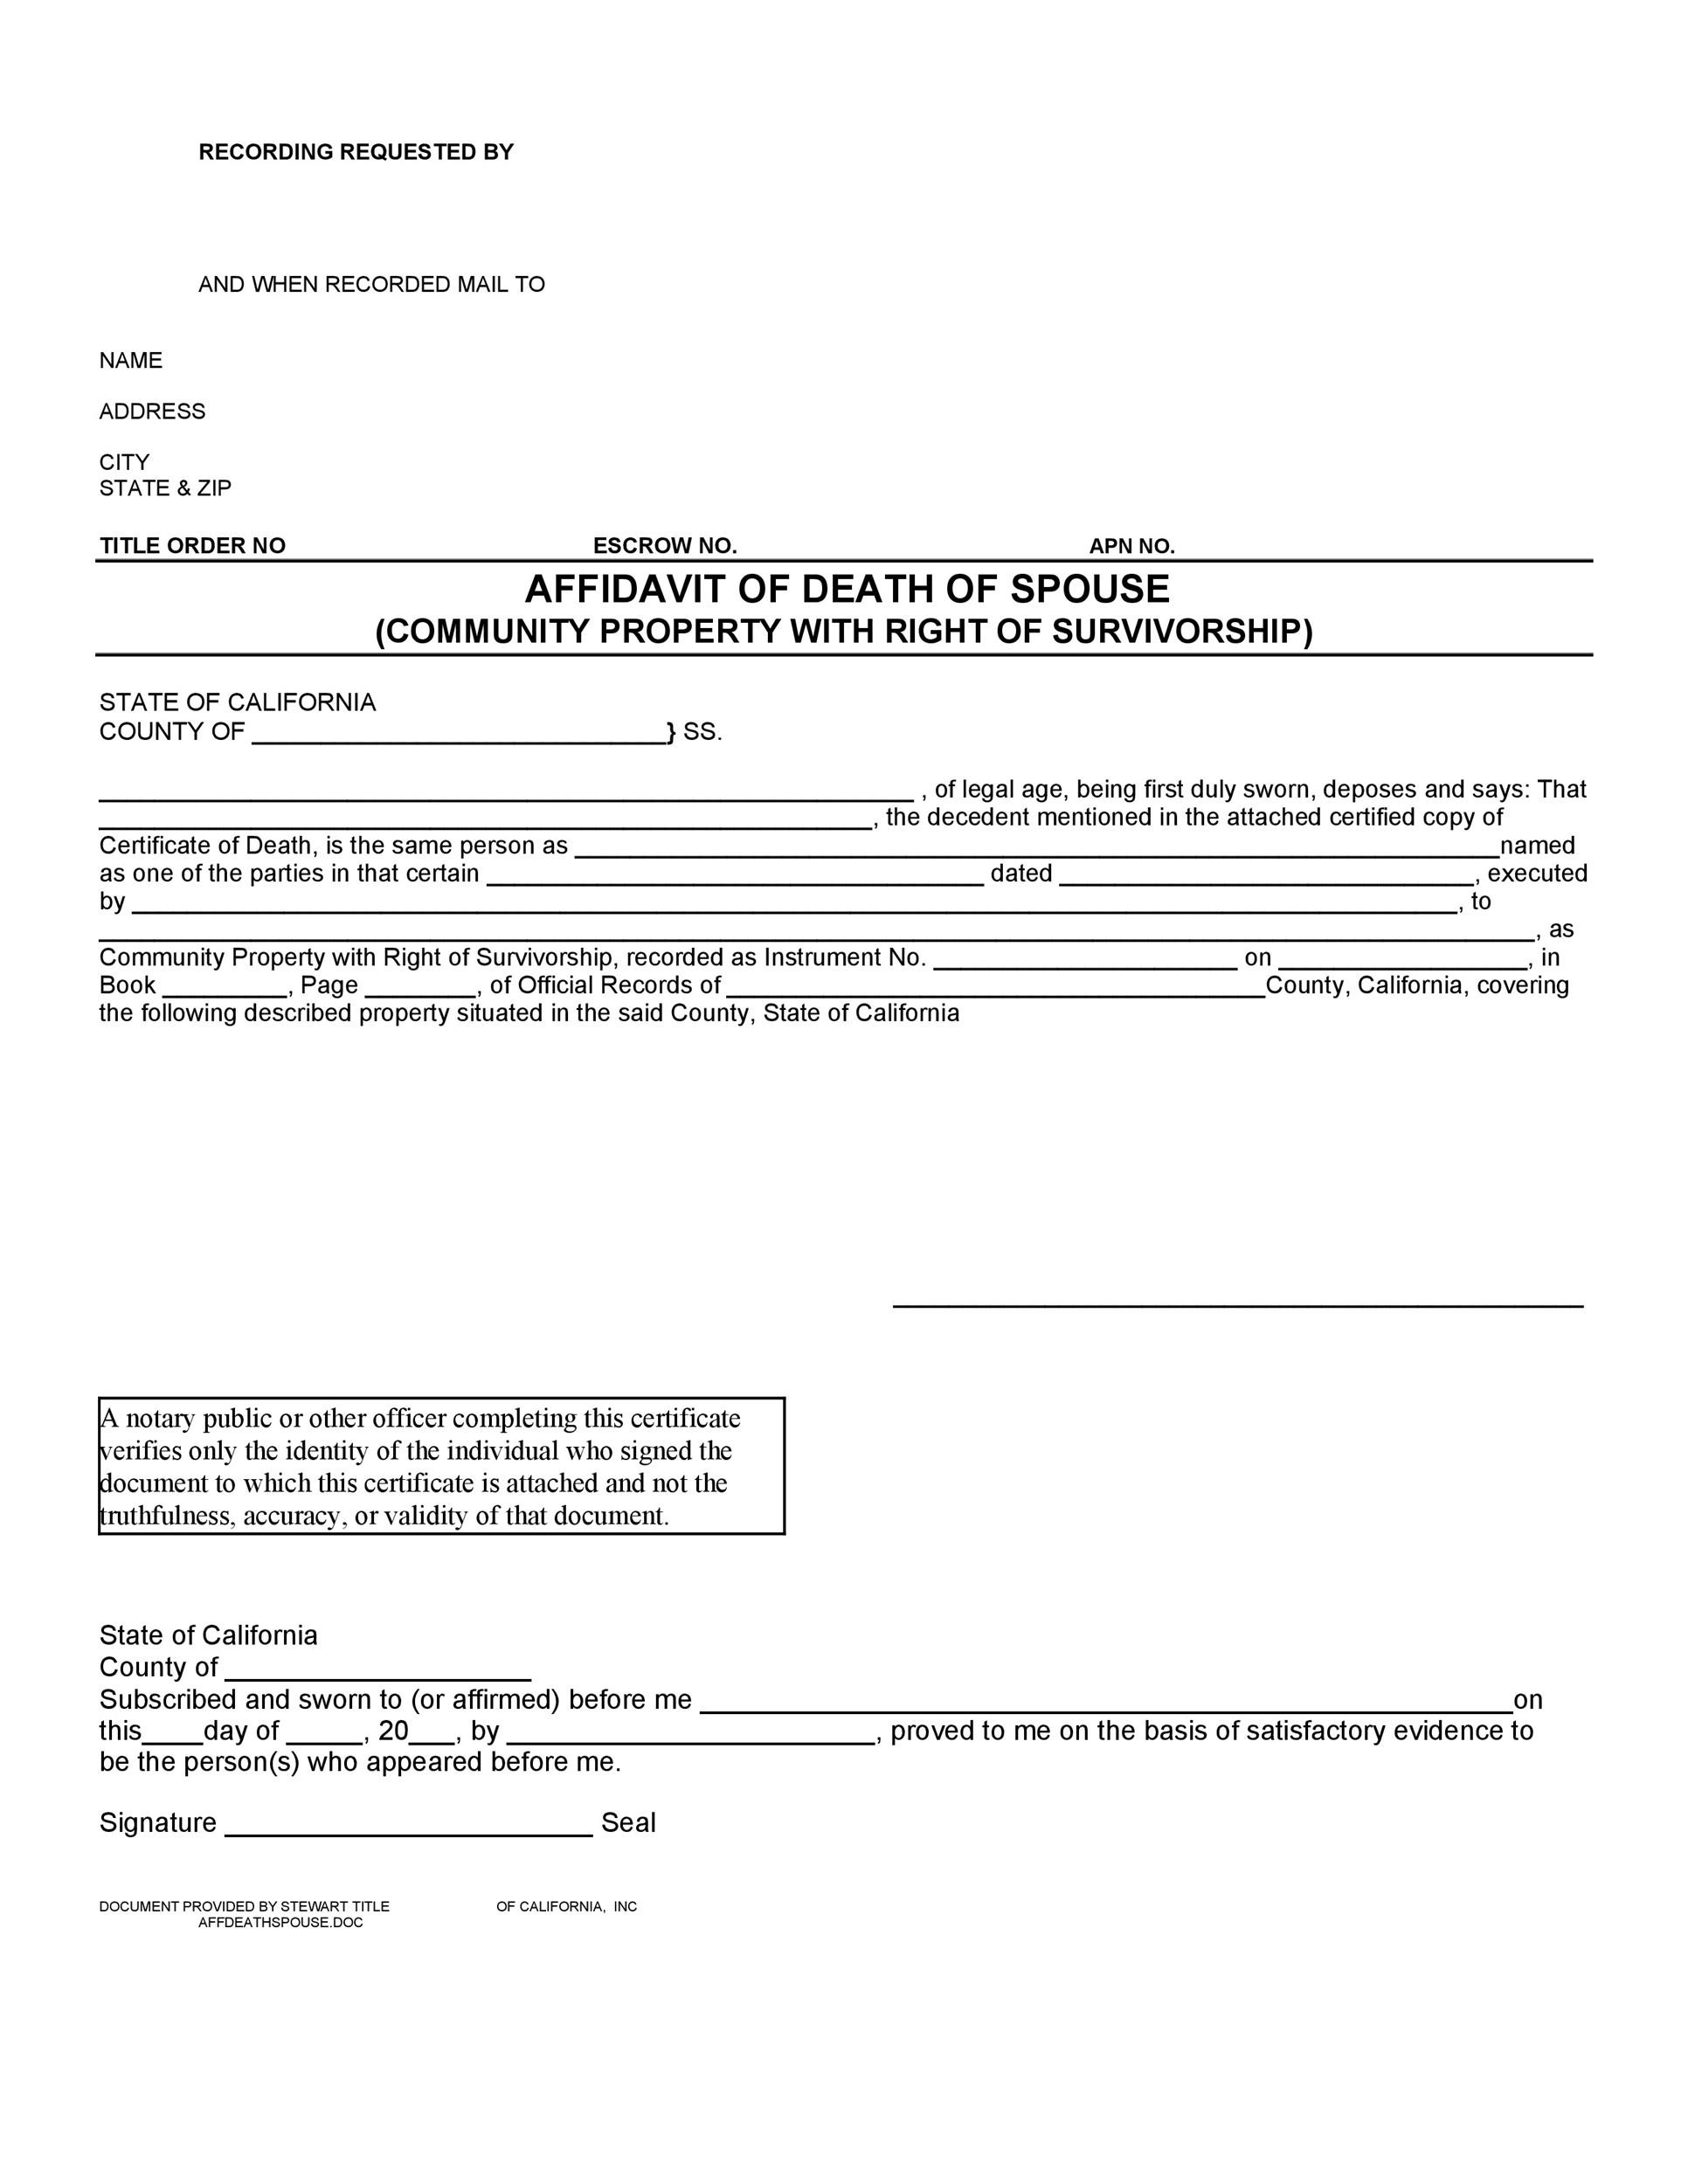 Free affidavit of death 17